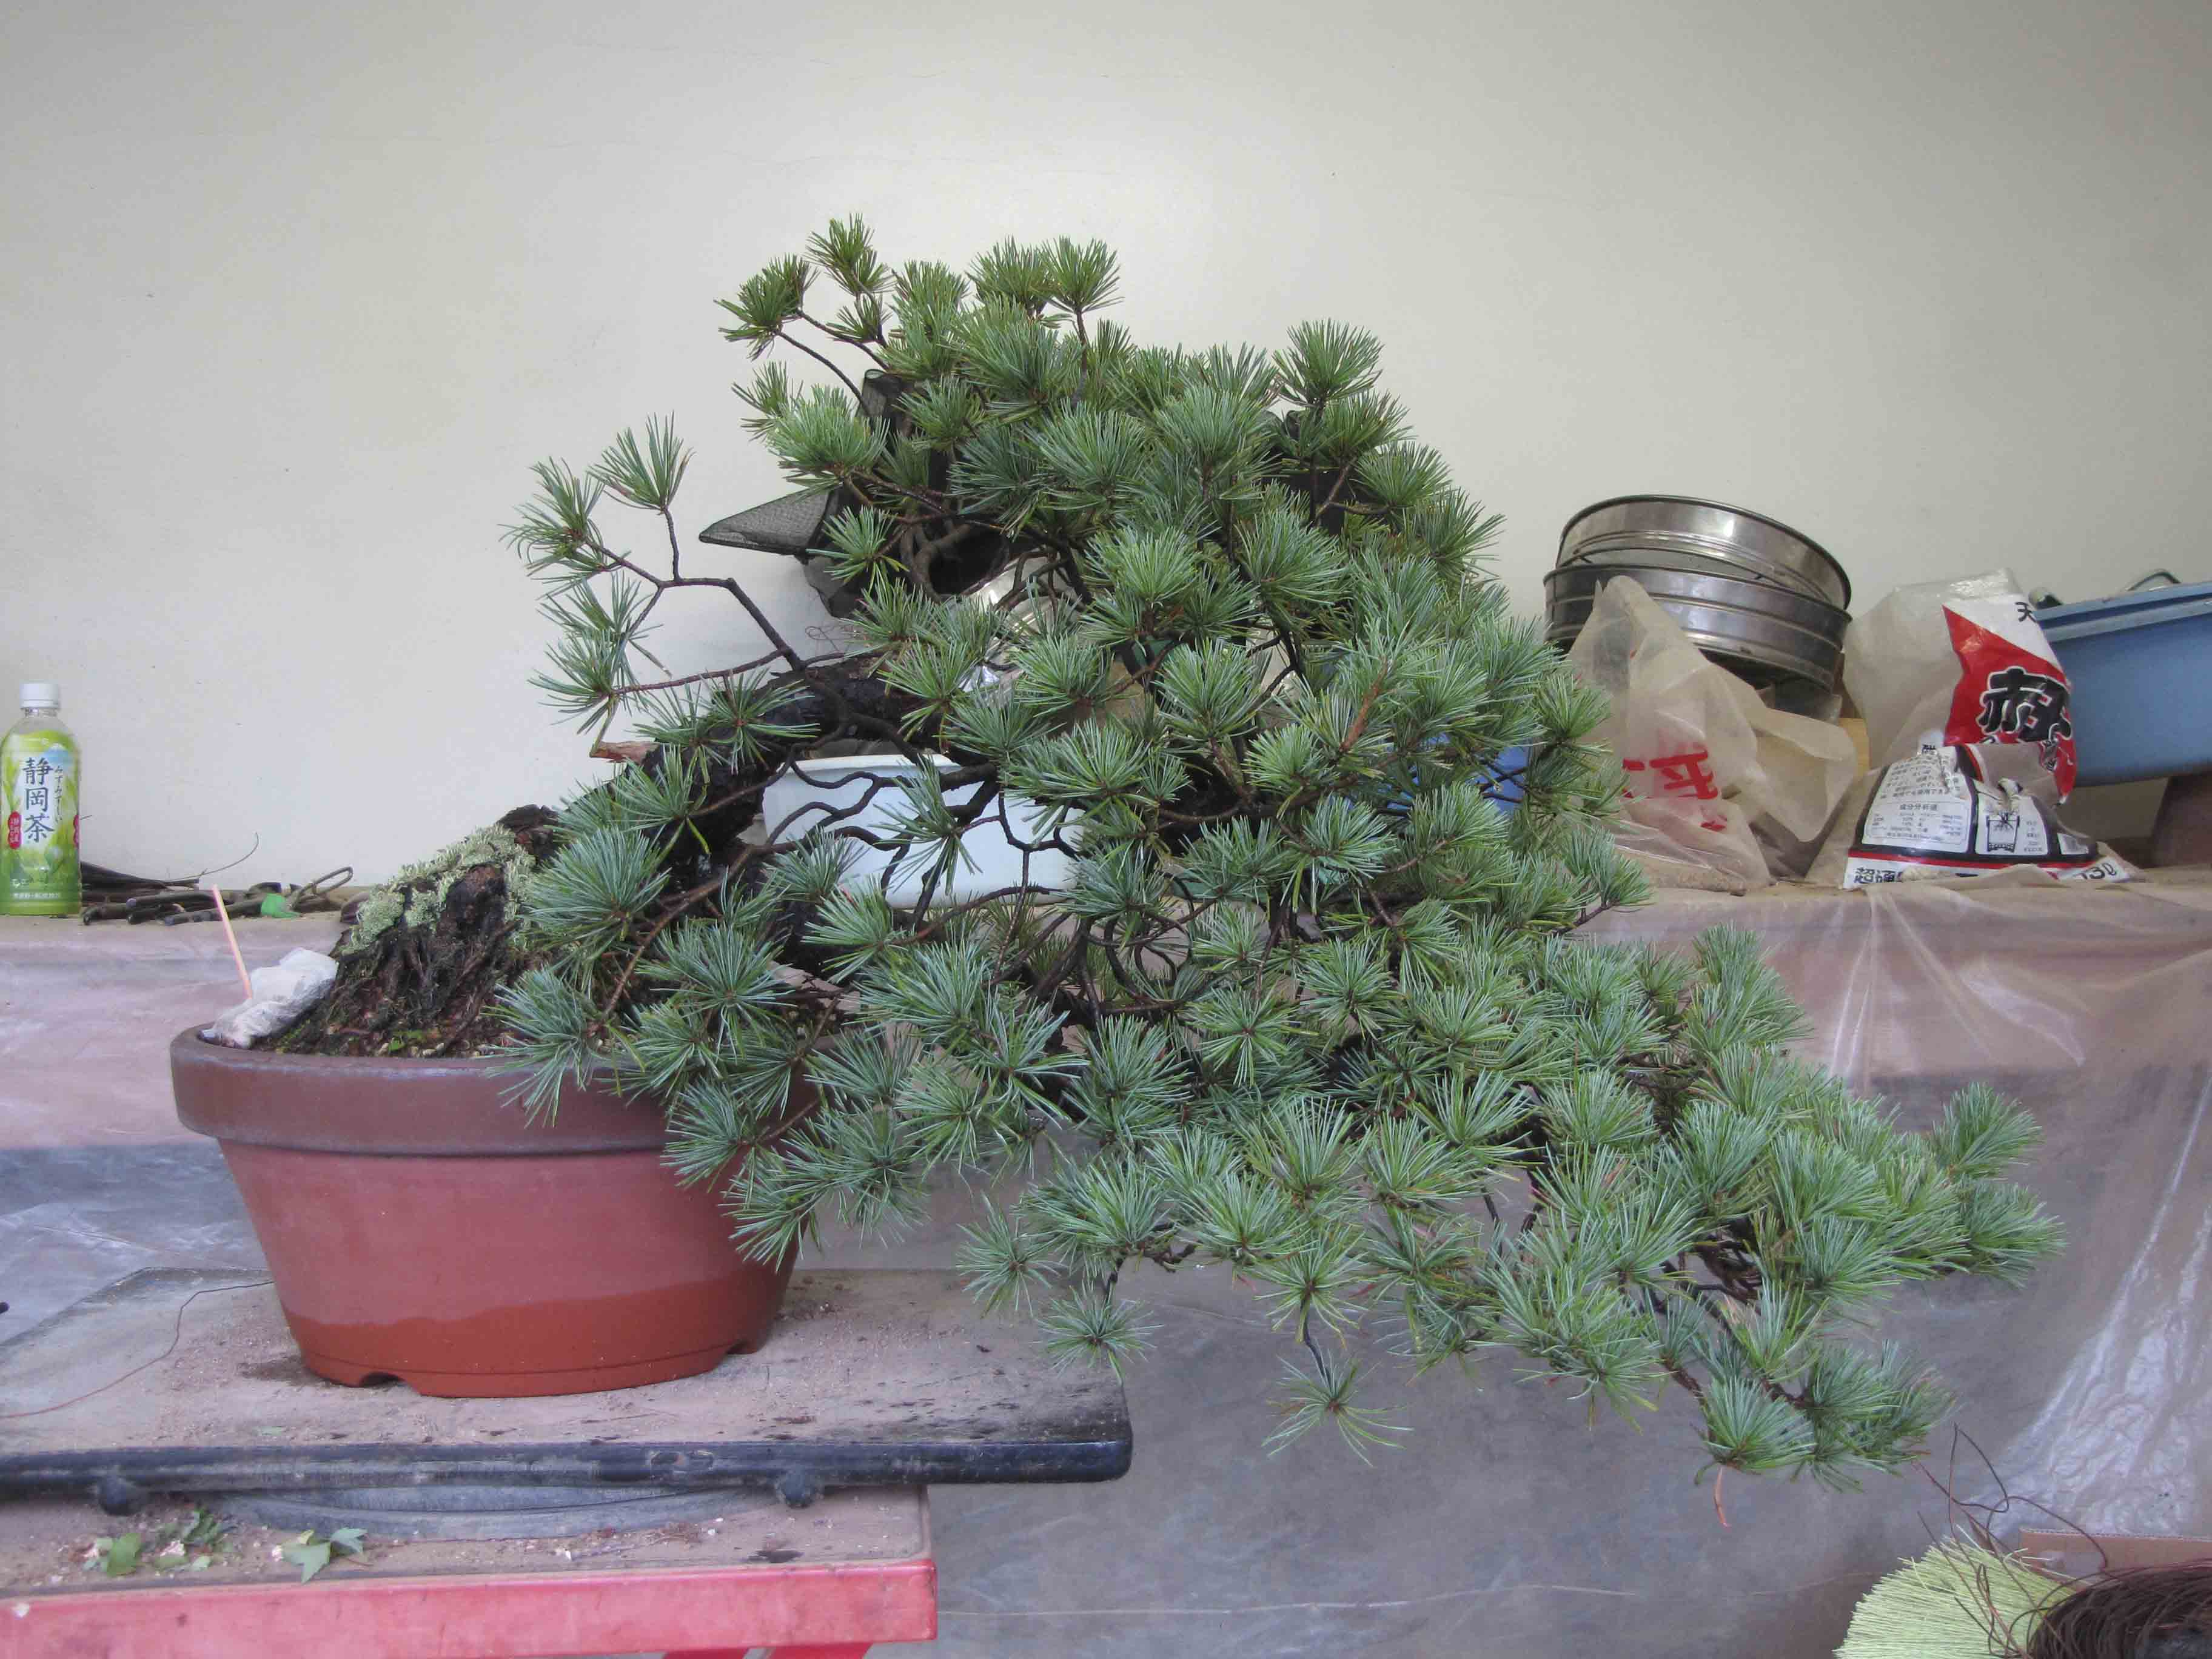 Phenomenal White Pine Wiring Peter Tea Bonsai Wiring Cloud Staixaidewilluminateatxorg